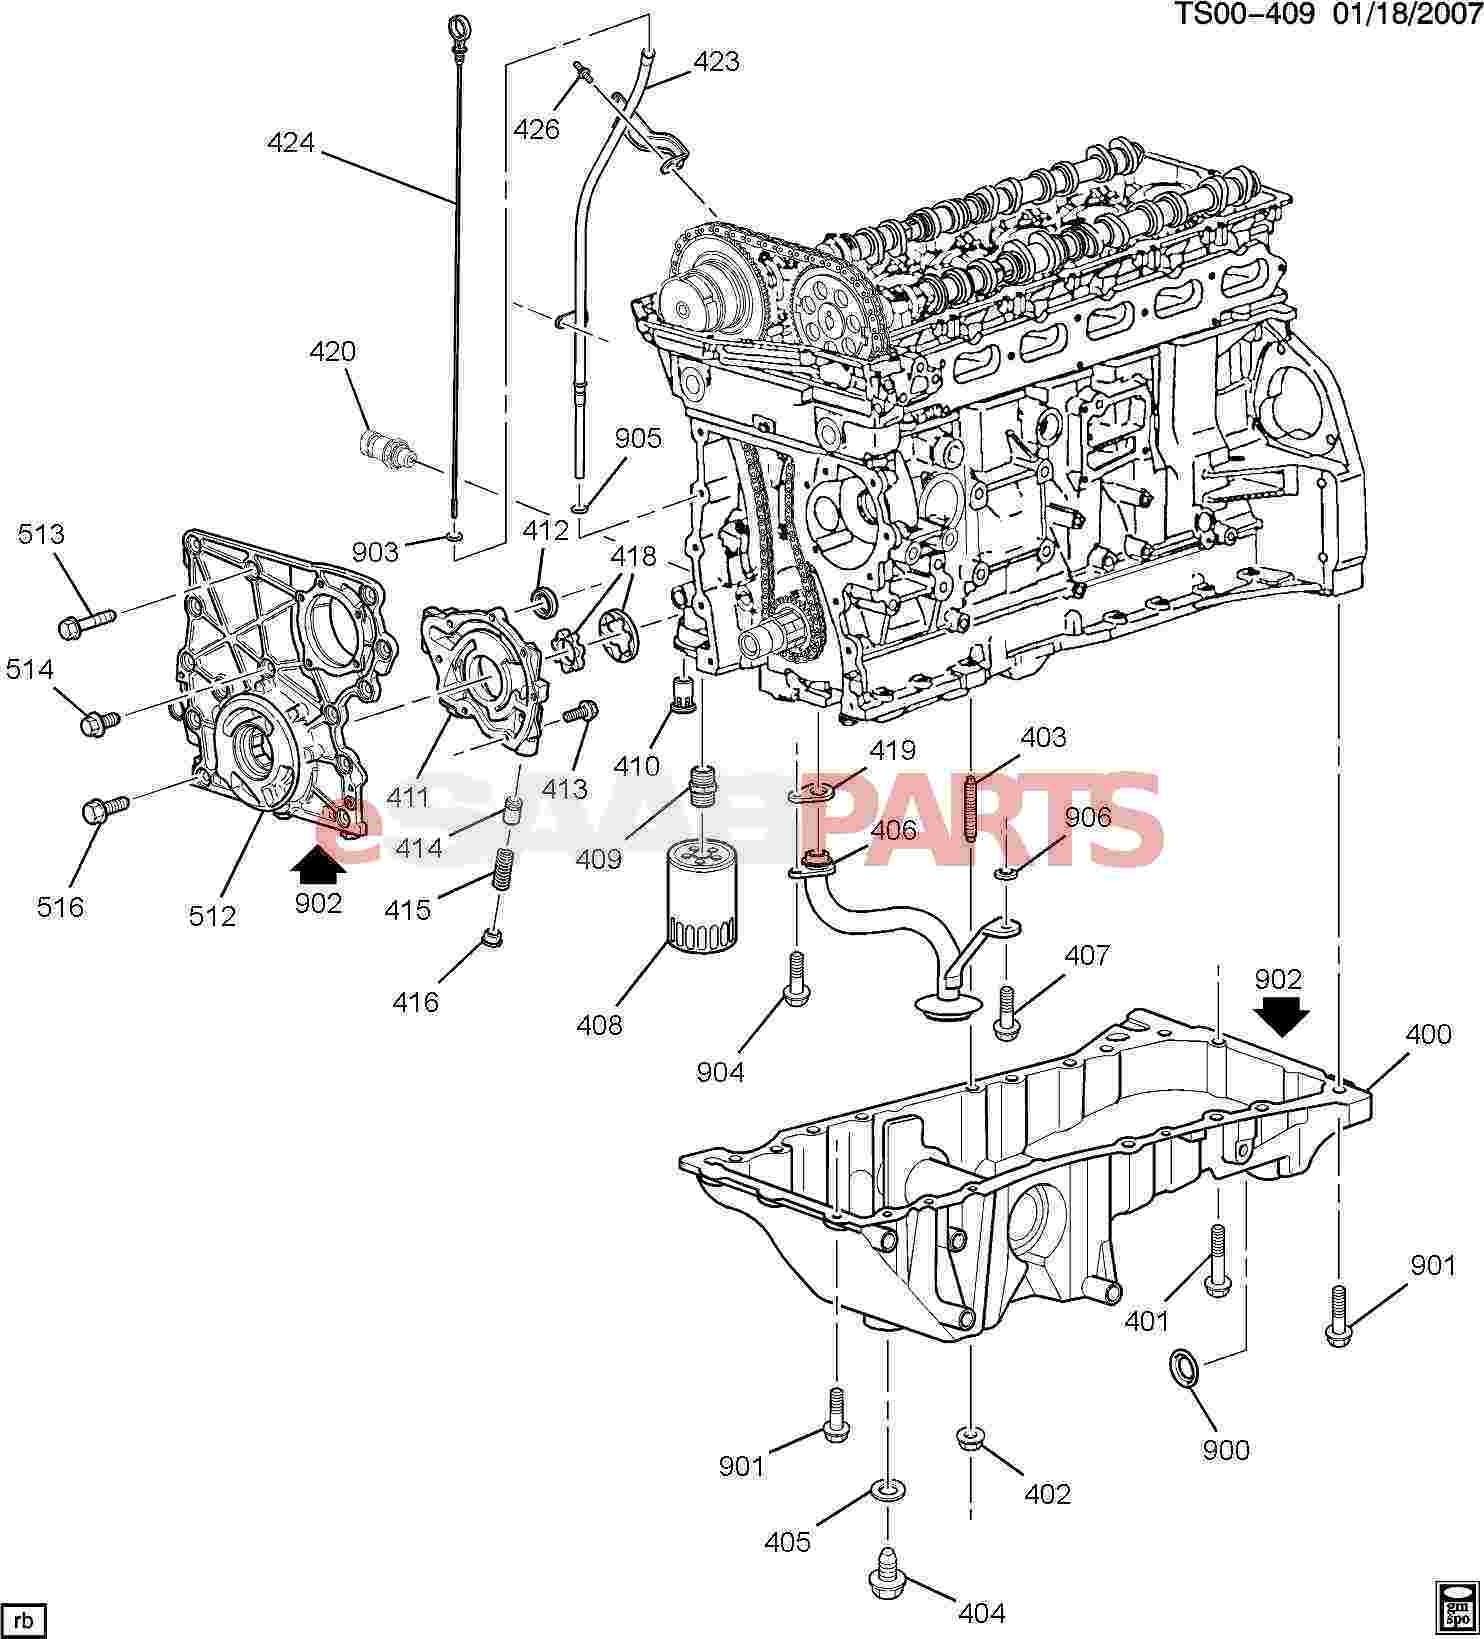 Porsche 944 Engine Diagrams Rg500 Wiring Diagram Vw Fuse